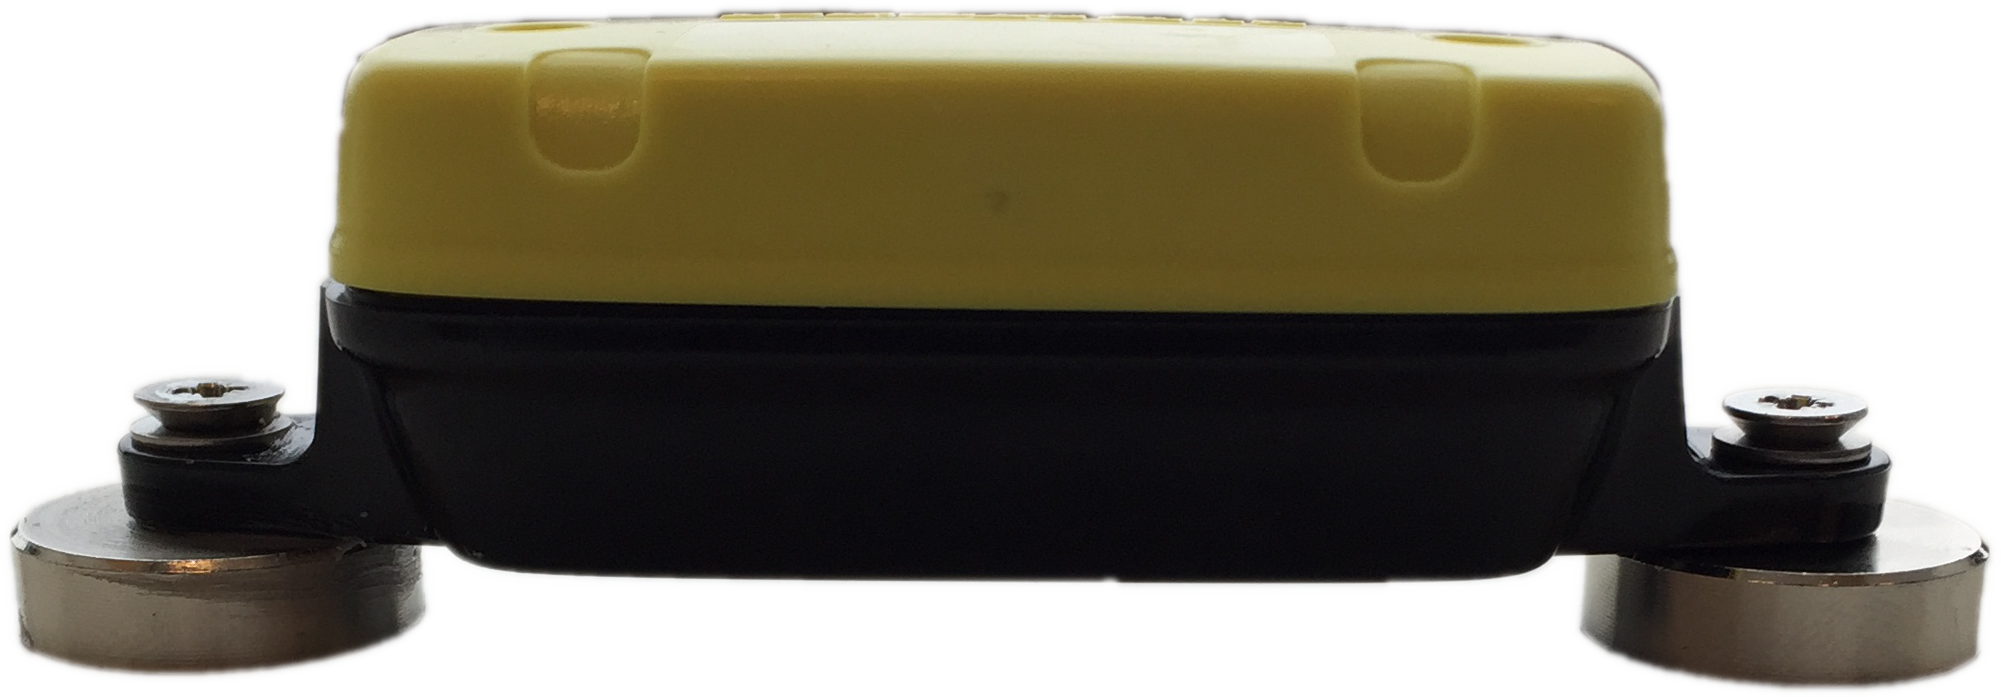 prorail magneten zijaanzicht transparante achtergrond.png